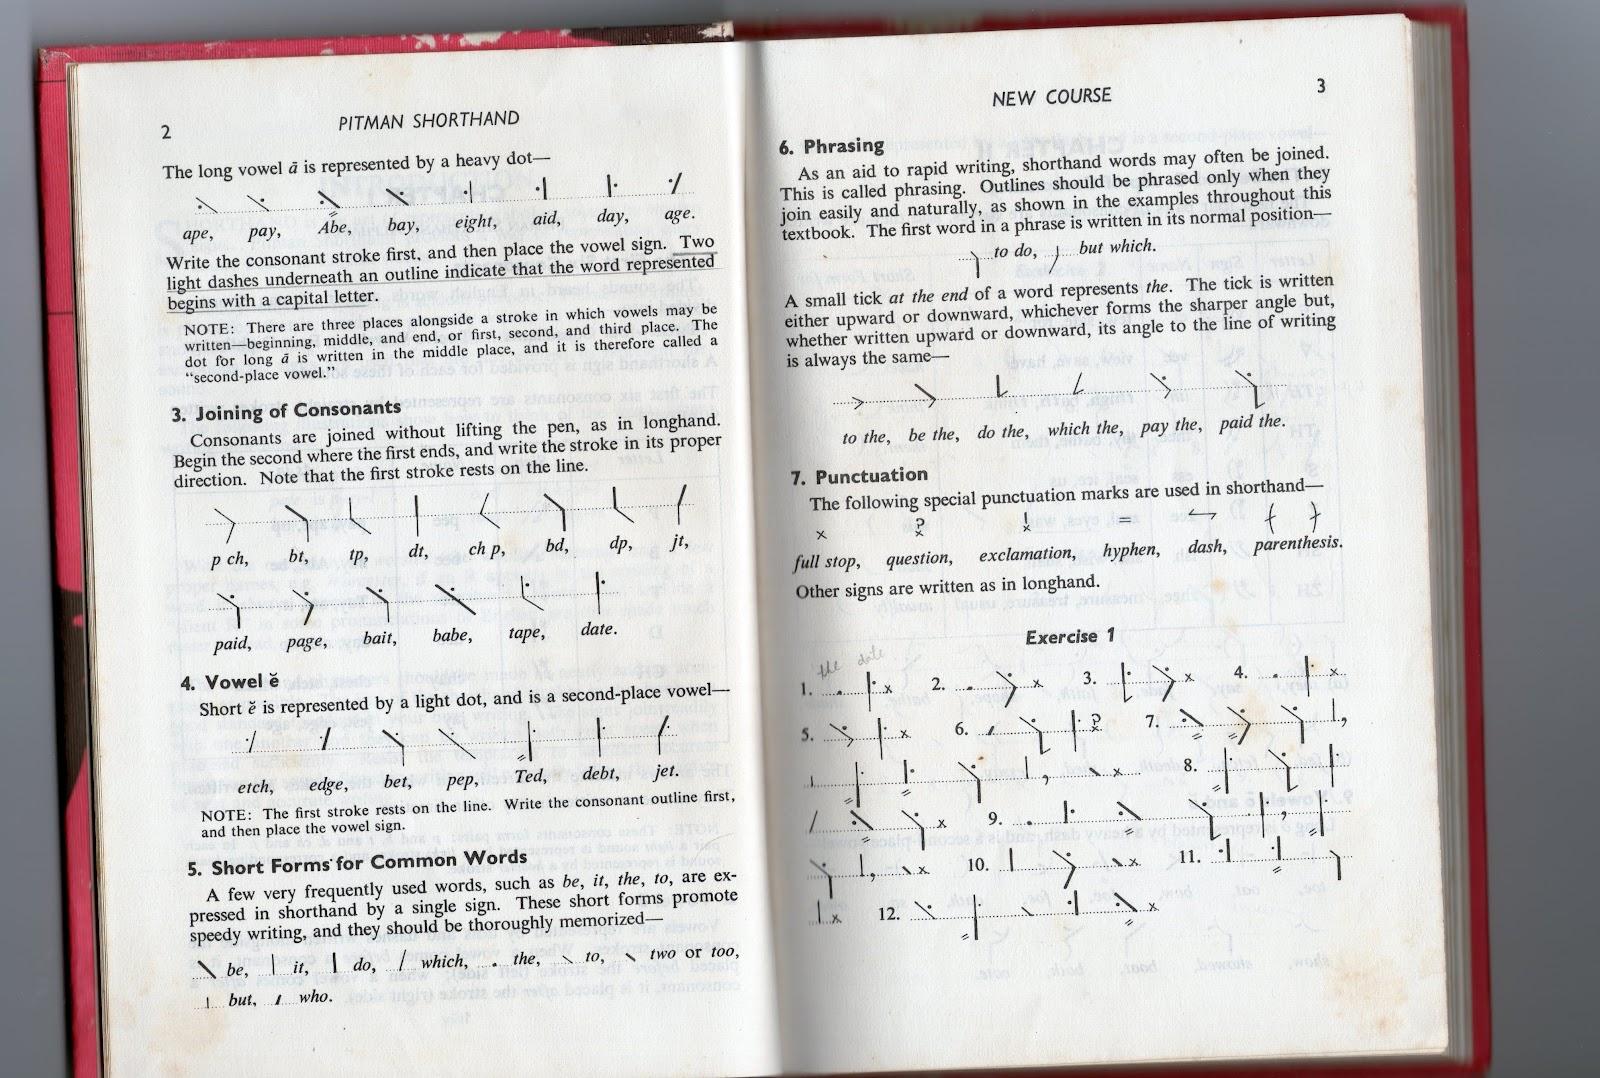 sir isaac pitman shorthand dictionary pdf